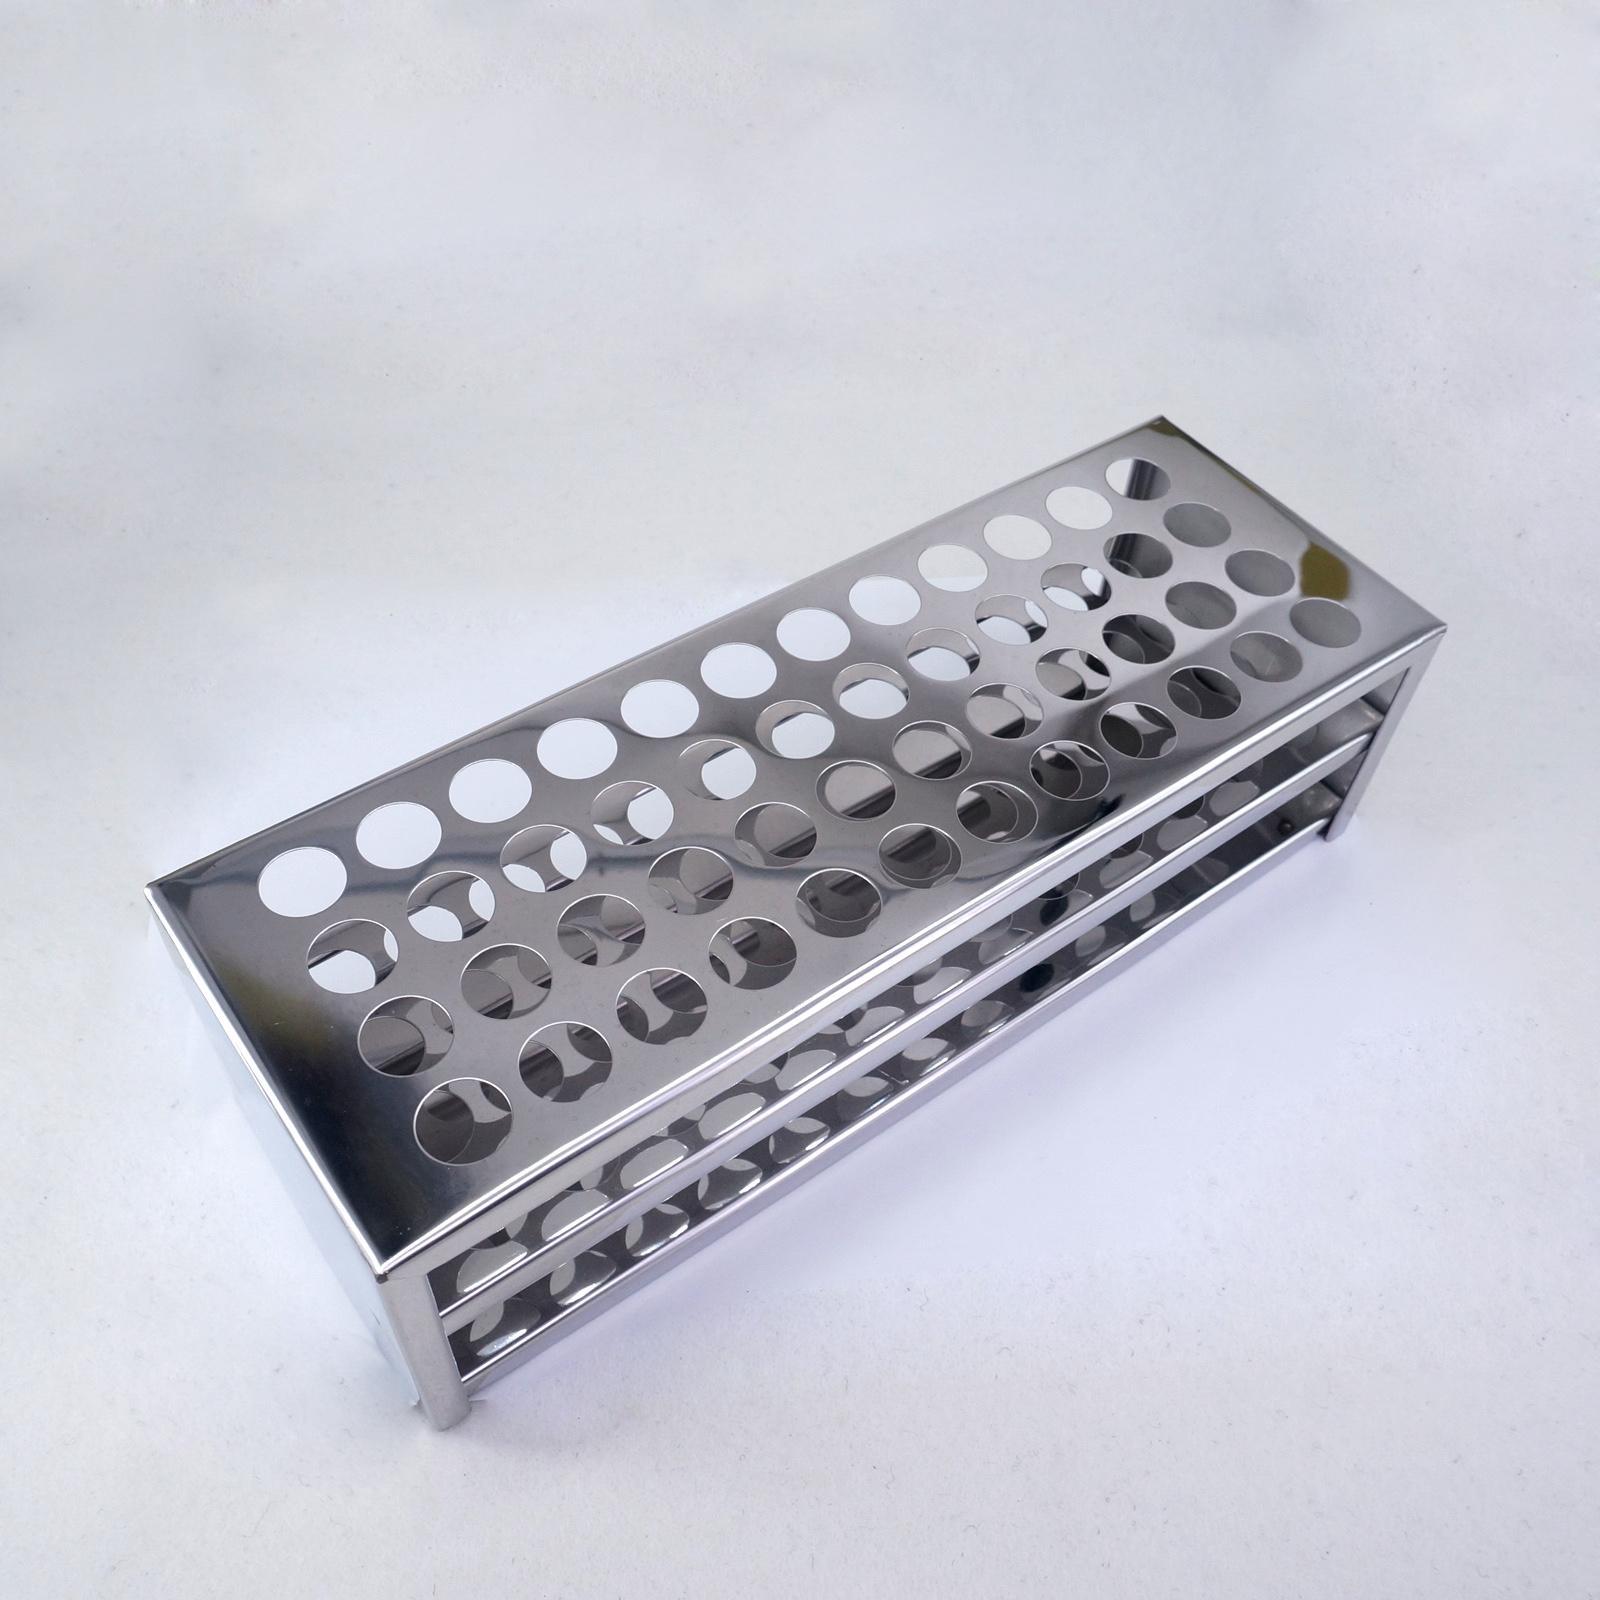 16mm Diam X 48 Holes Stainless Steel Test Tube Rack Holder Storage Lab Stand